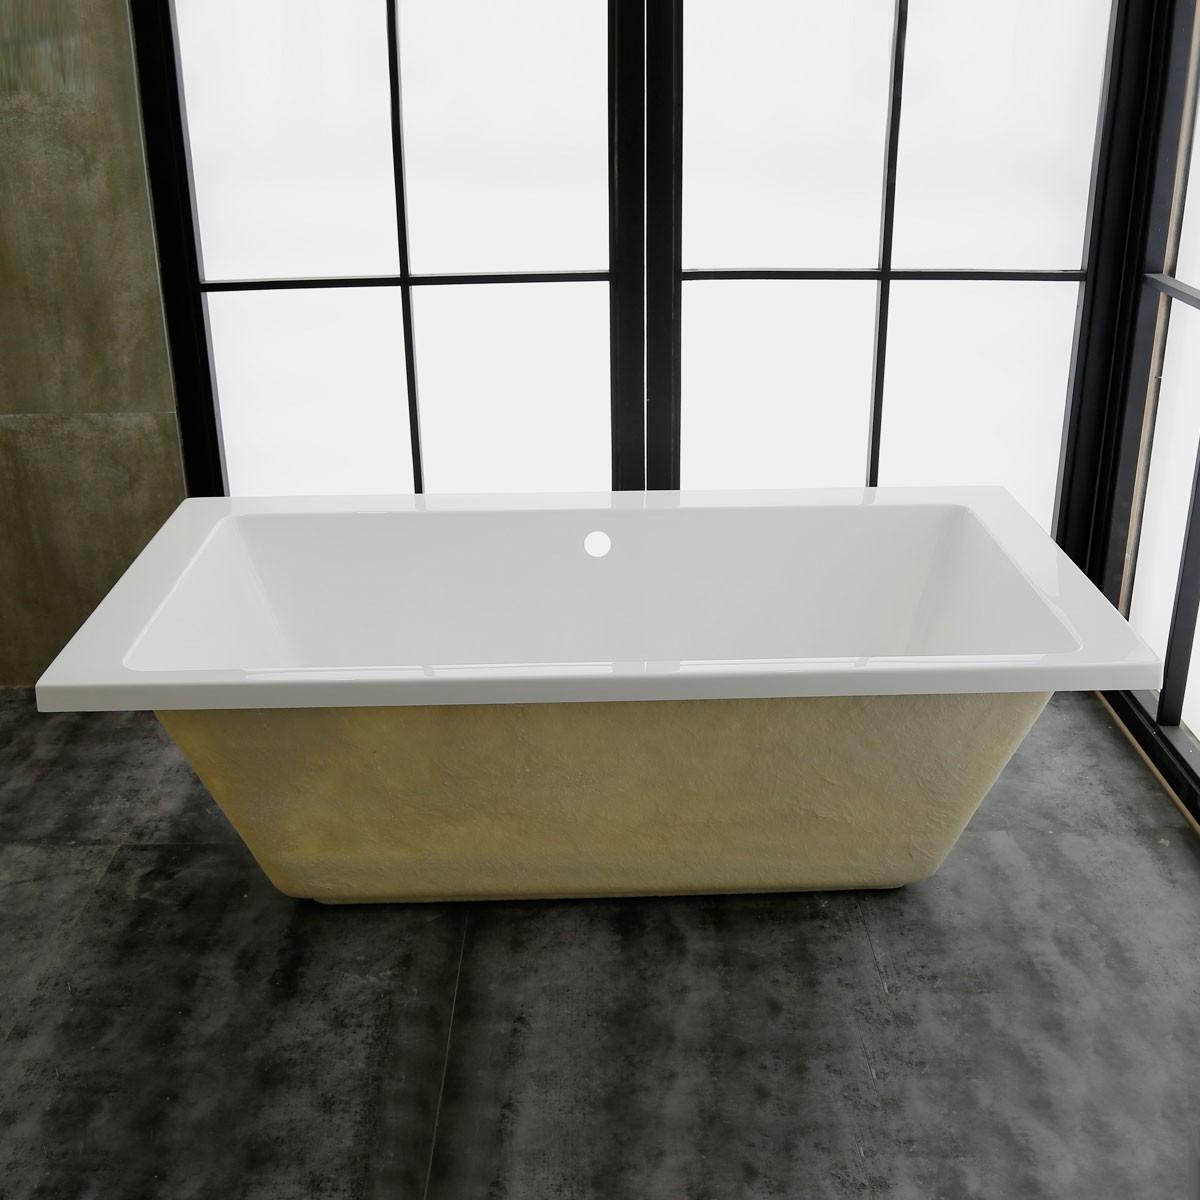 67 po baignoire encastrable blanche en acrylique de salle de bain dk mec3057b decoraport canada Baignoire acrylique salle bains